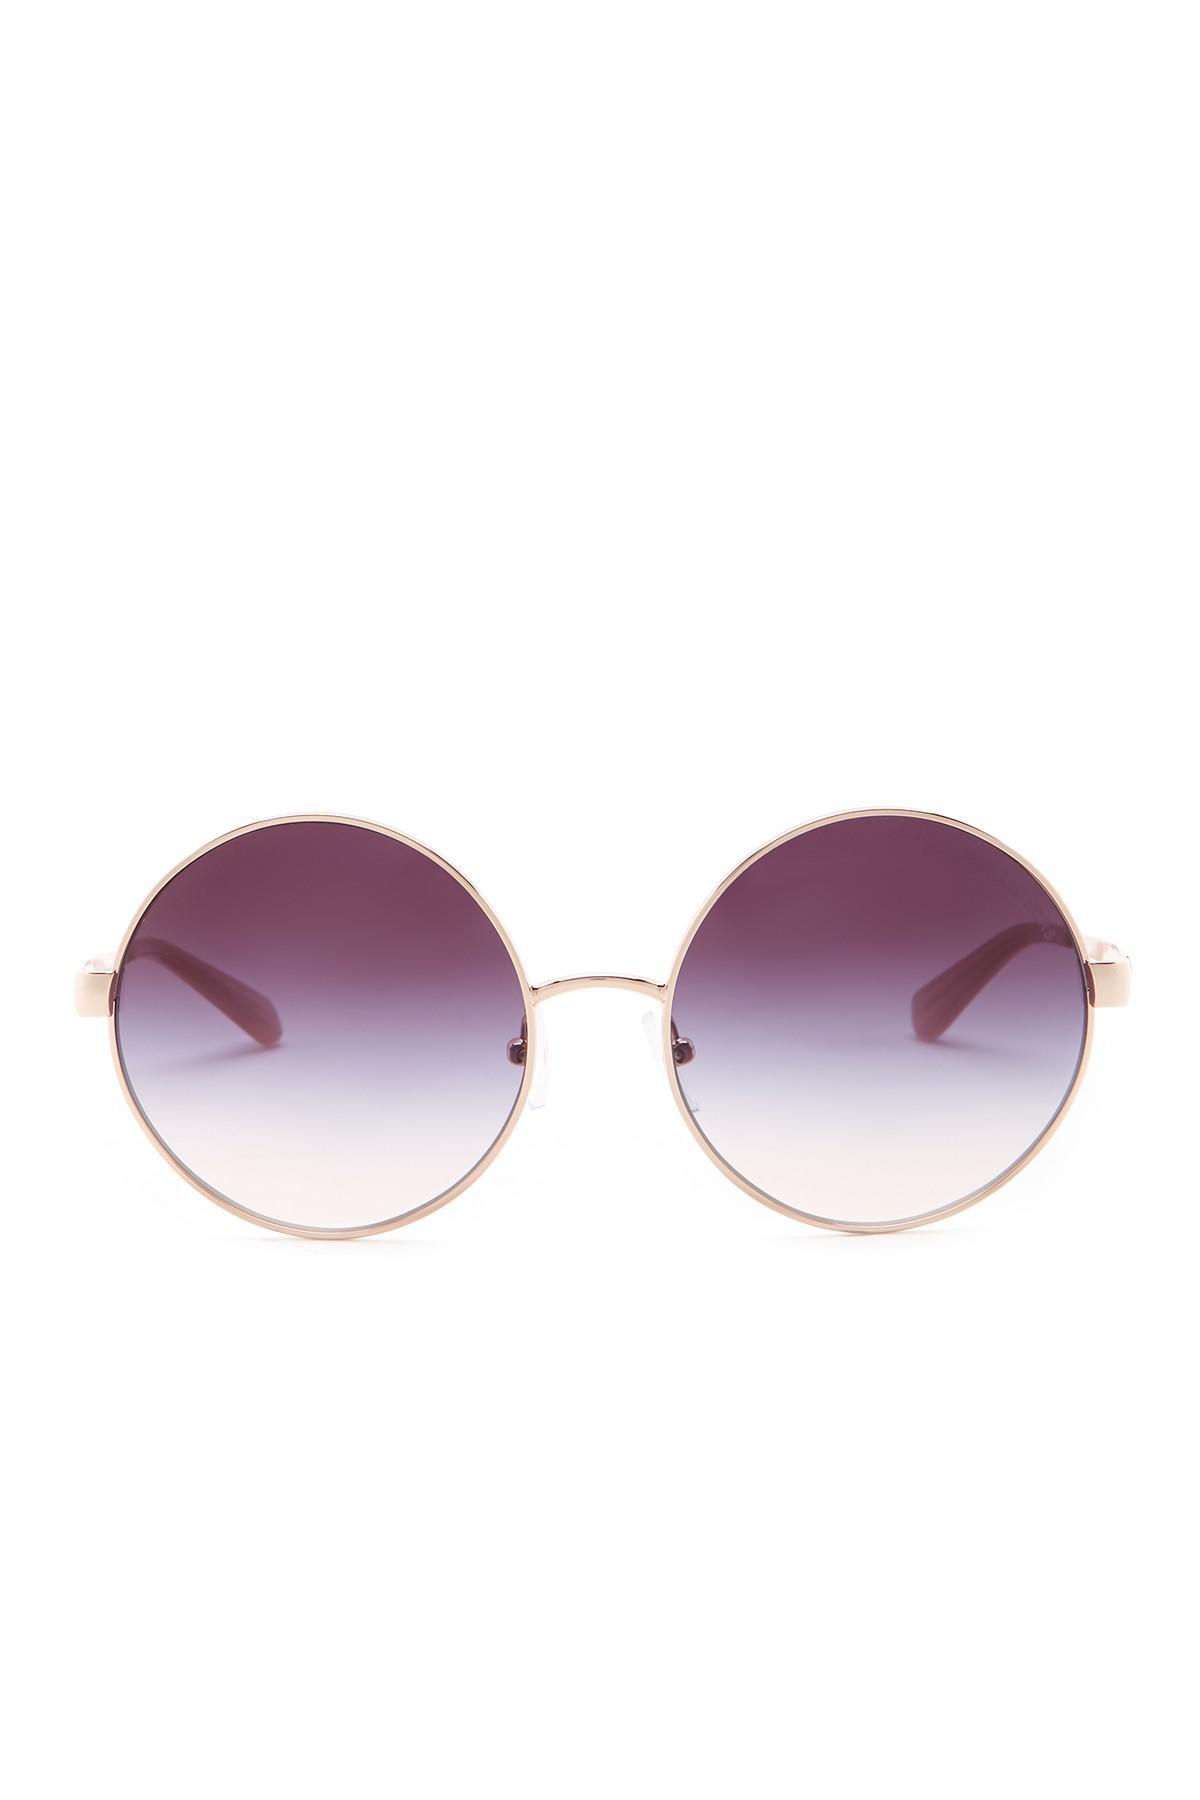 748ef398fc Michael Kors Cho 56mm Round Sunglasses in Purple - Lyst